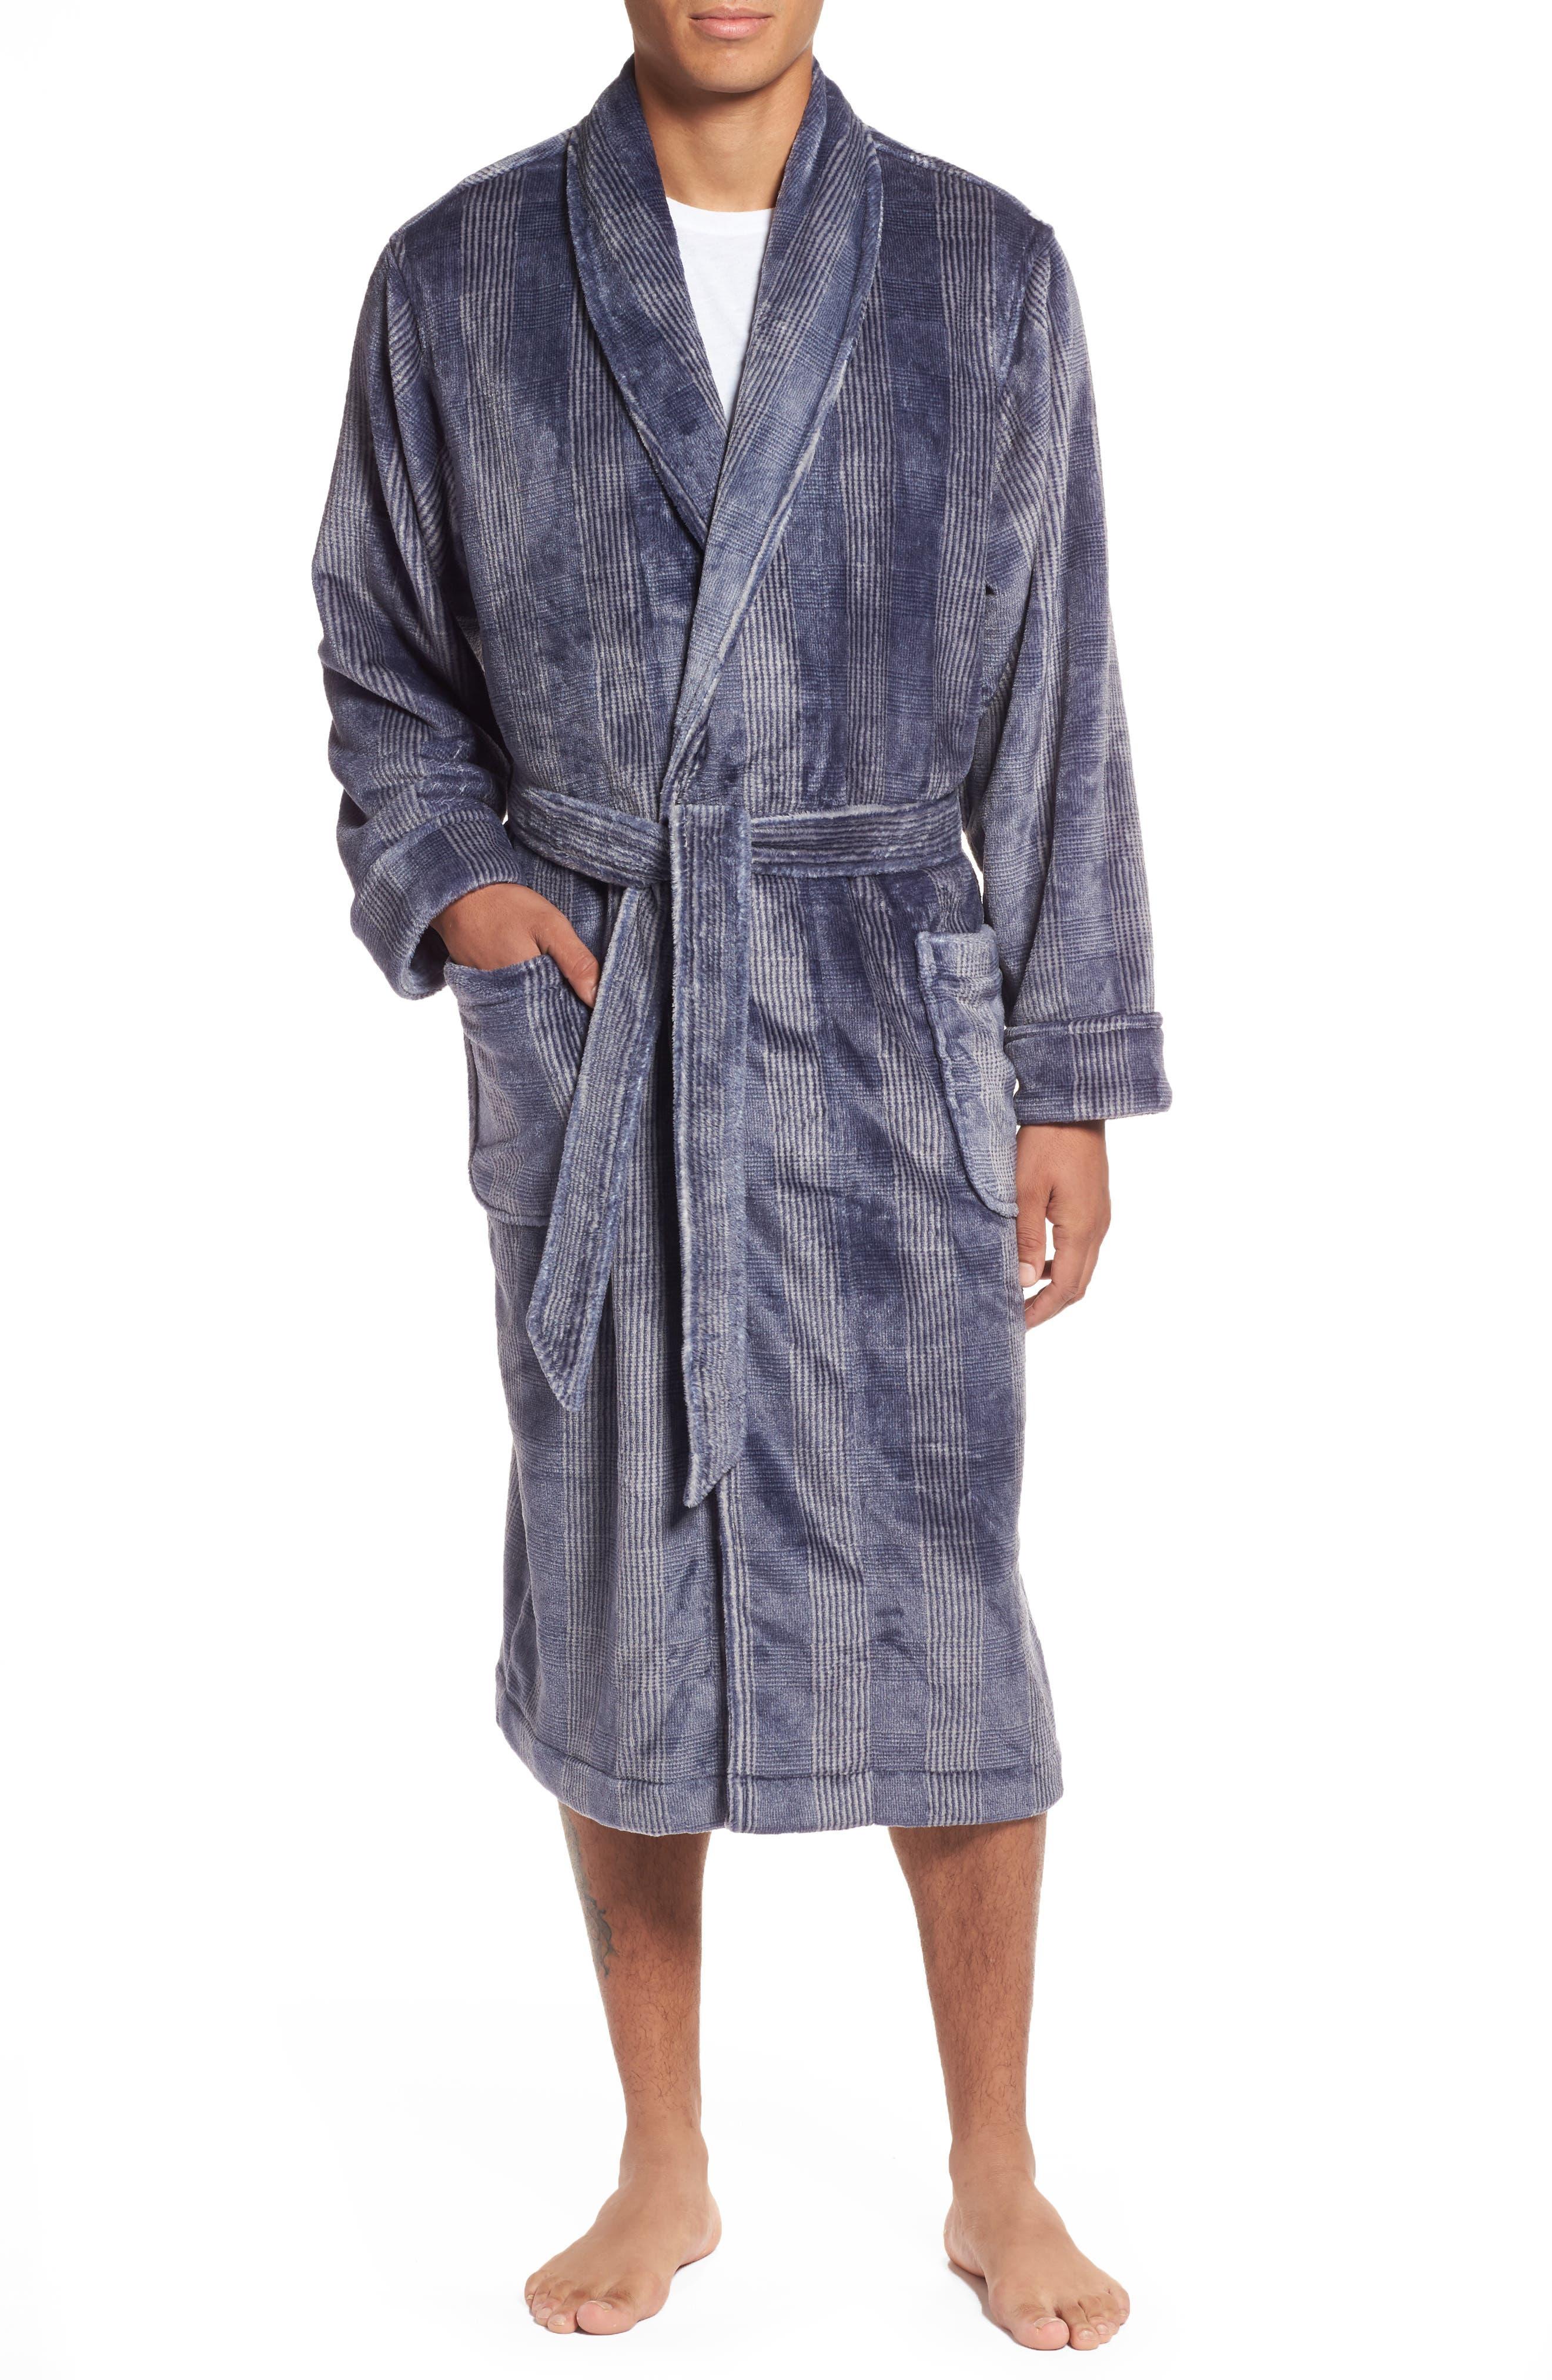 Alternate Image 1 Selected - Nordstrom Men's Shop Glen Check Fleece Robe